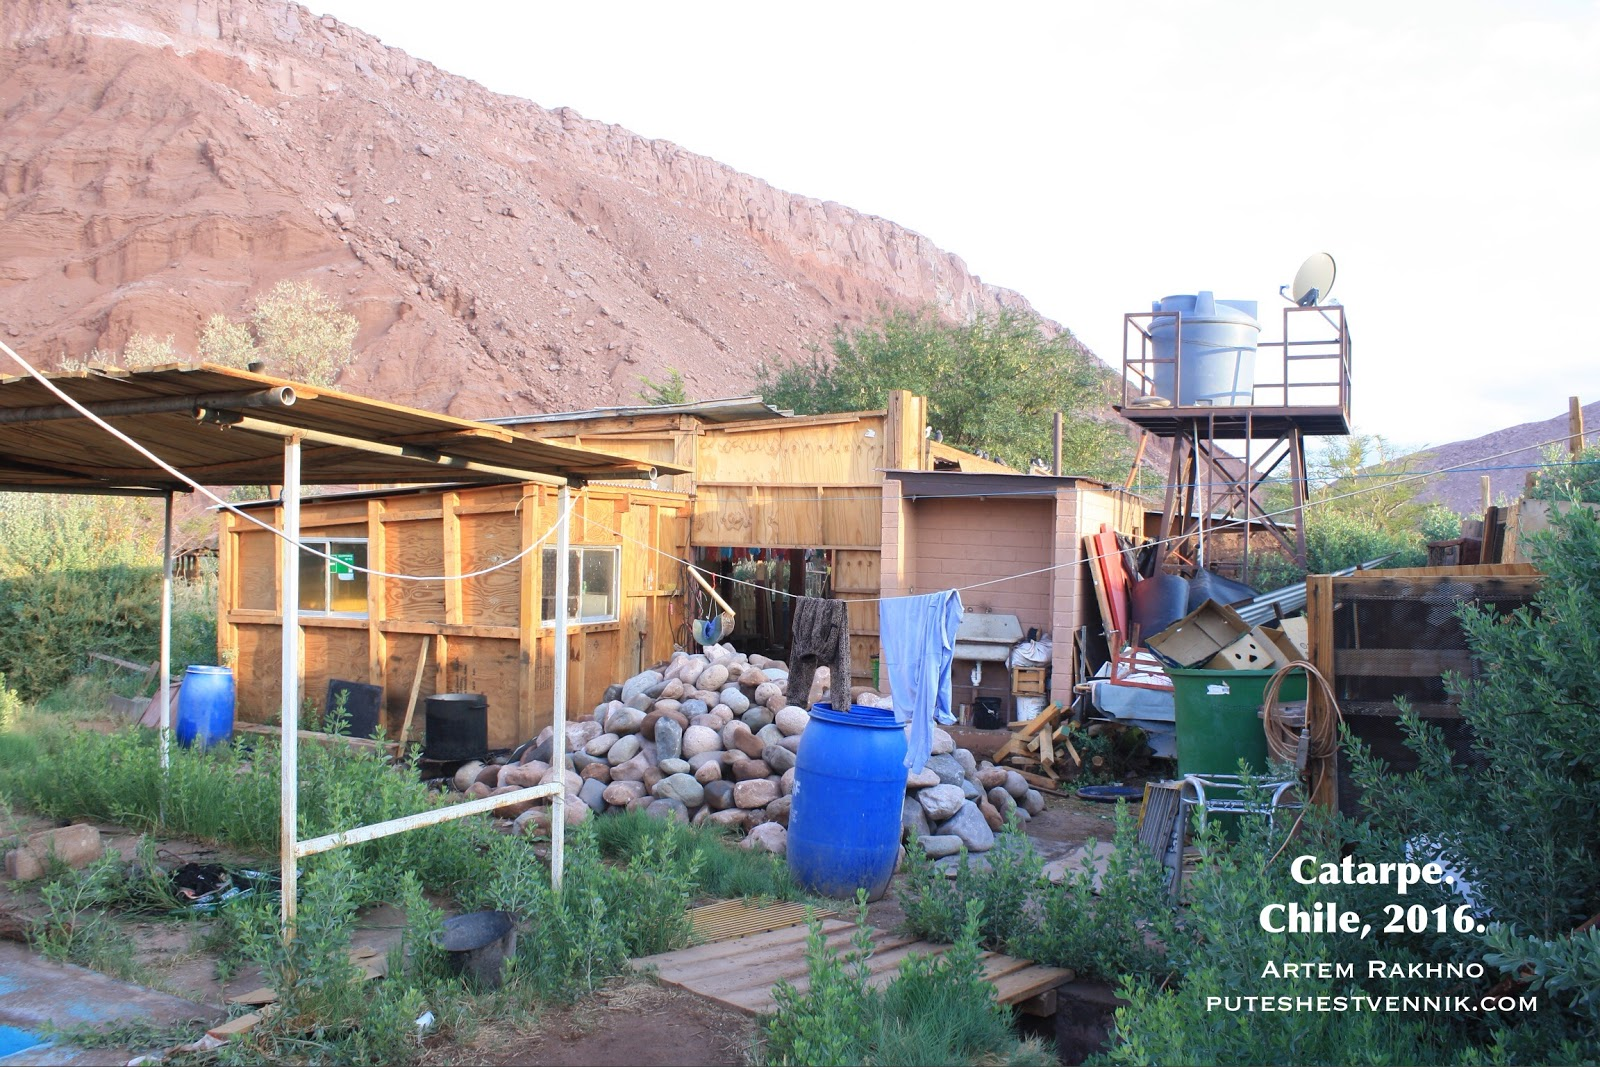 Дом в Комунидад Катарпэ